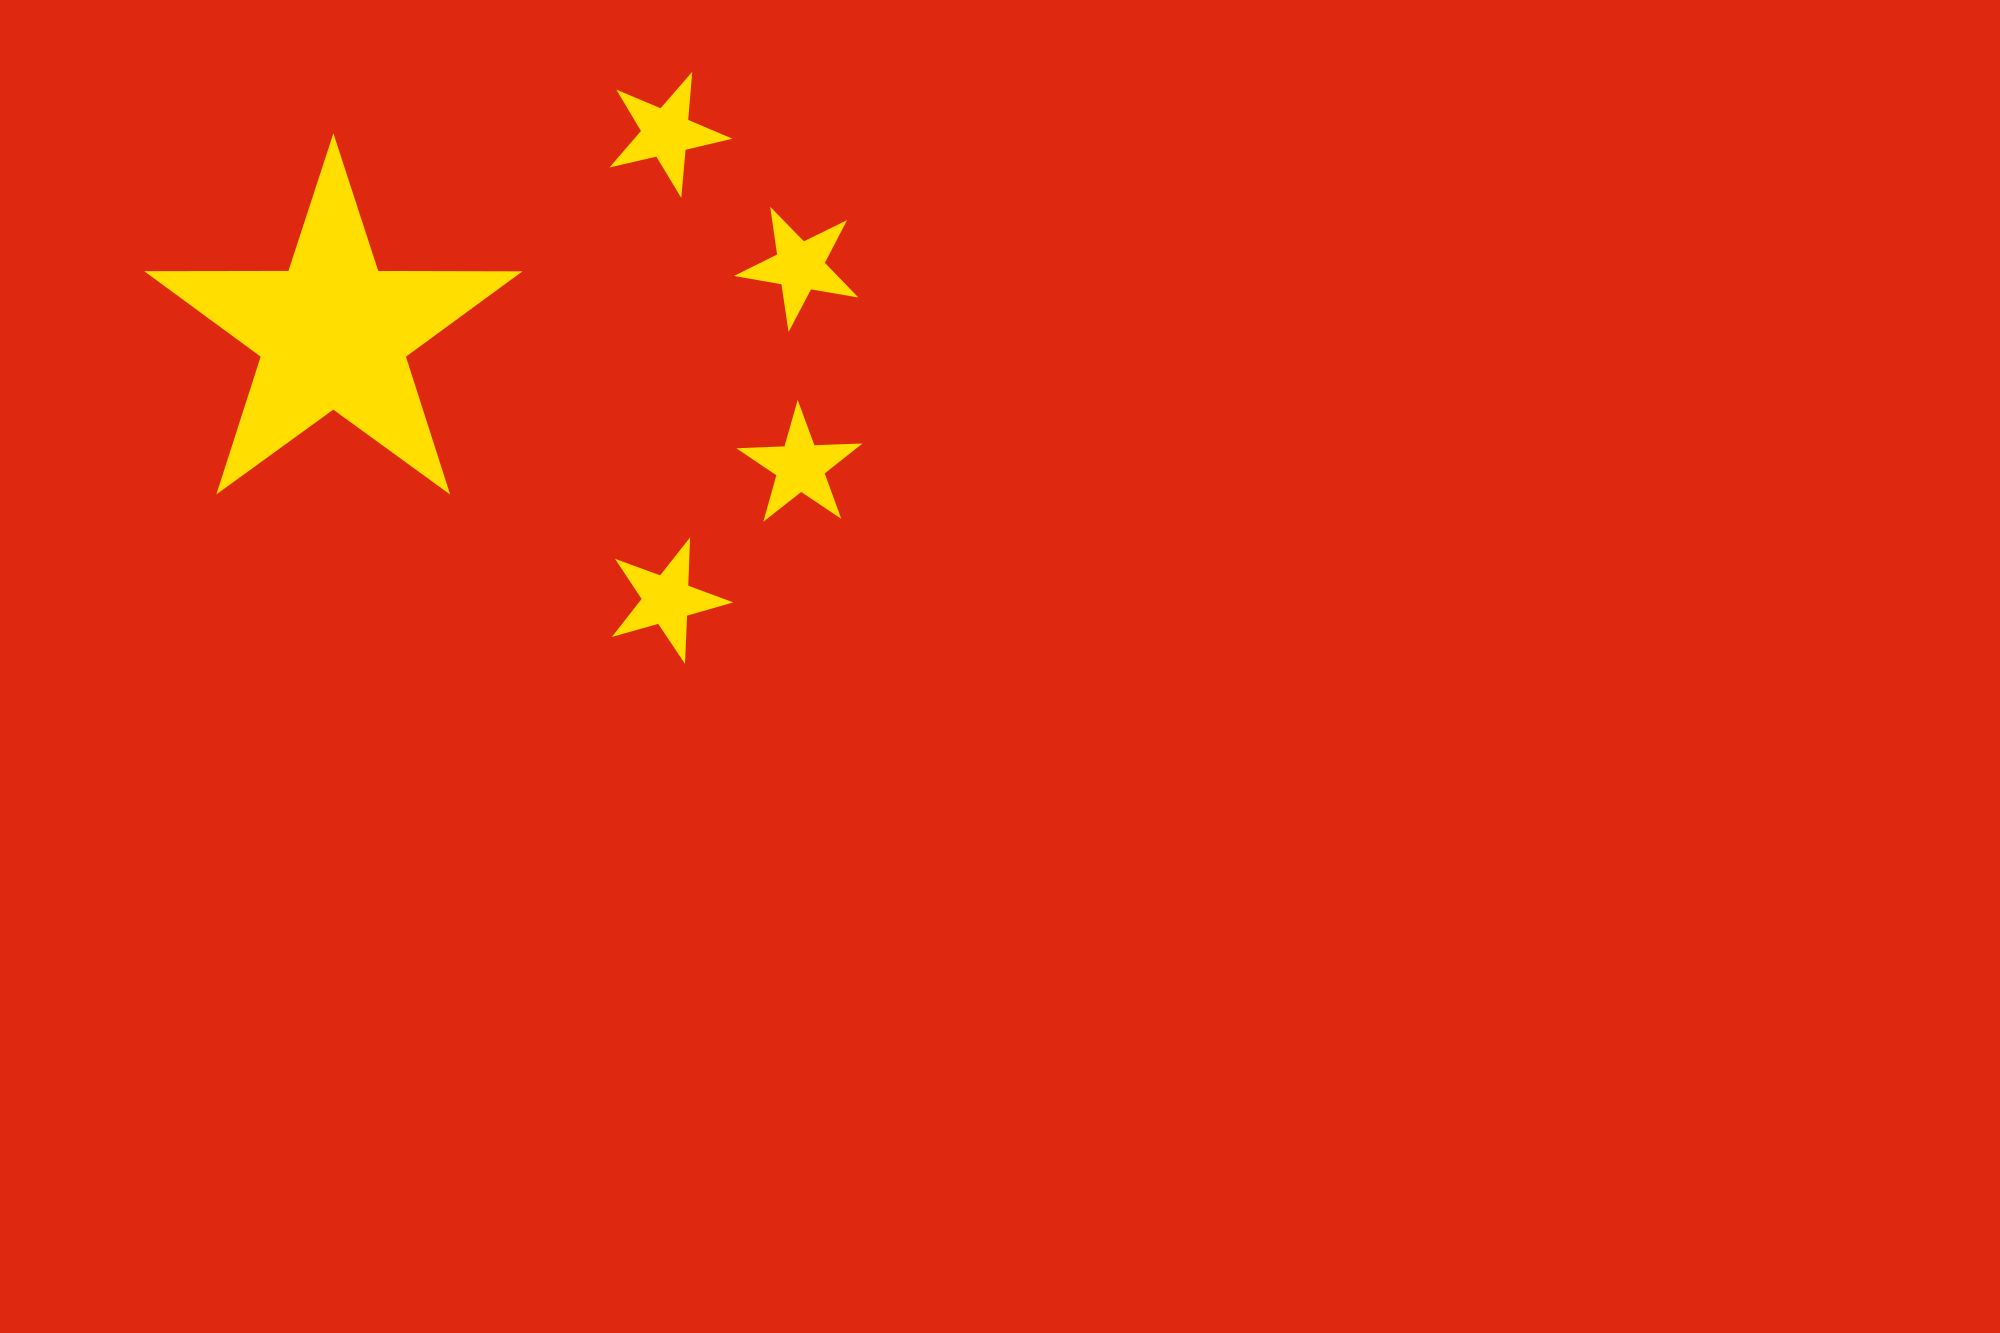 File:Flag of China.png.